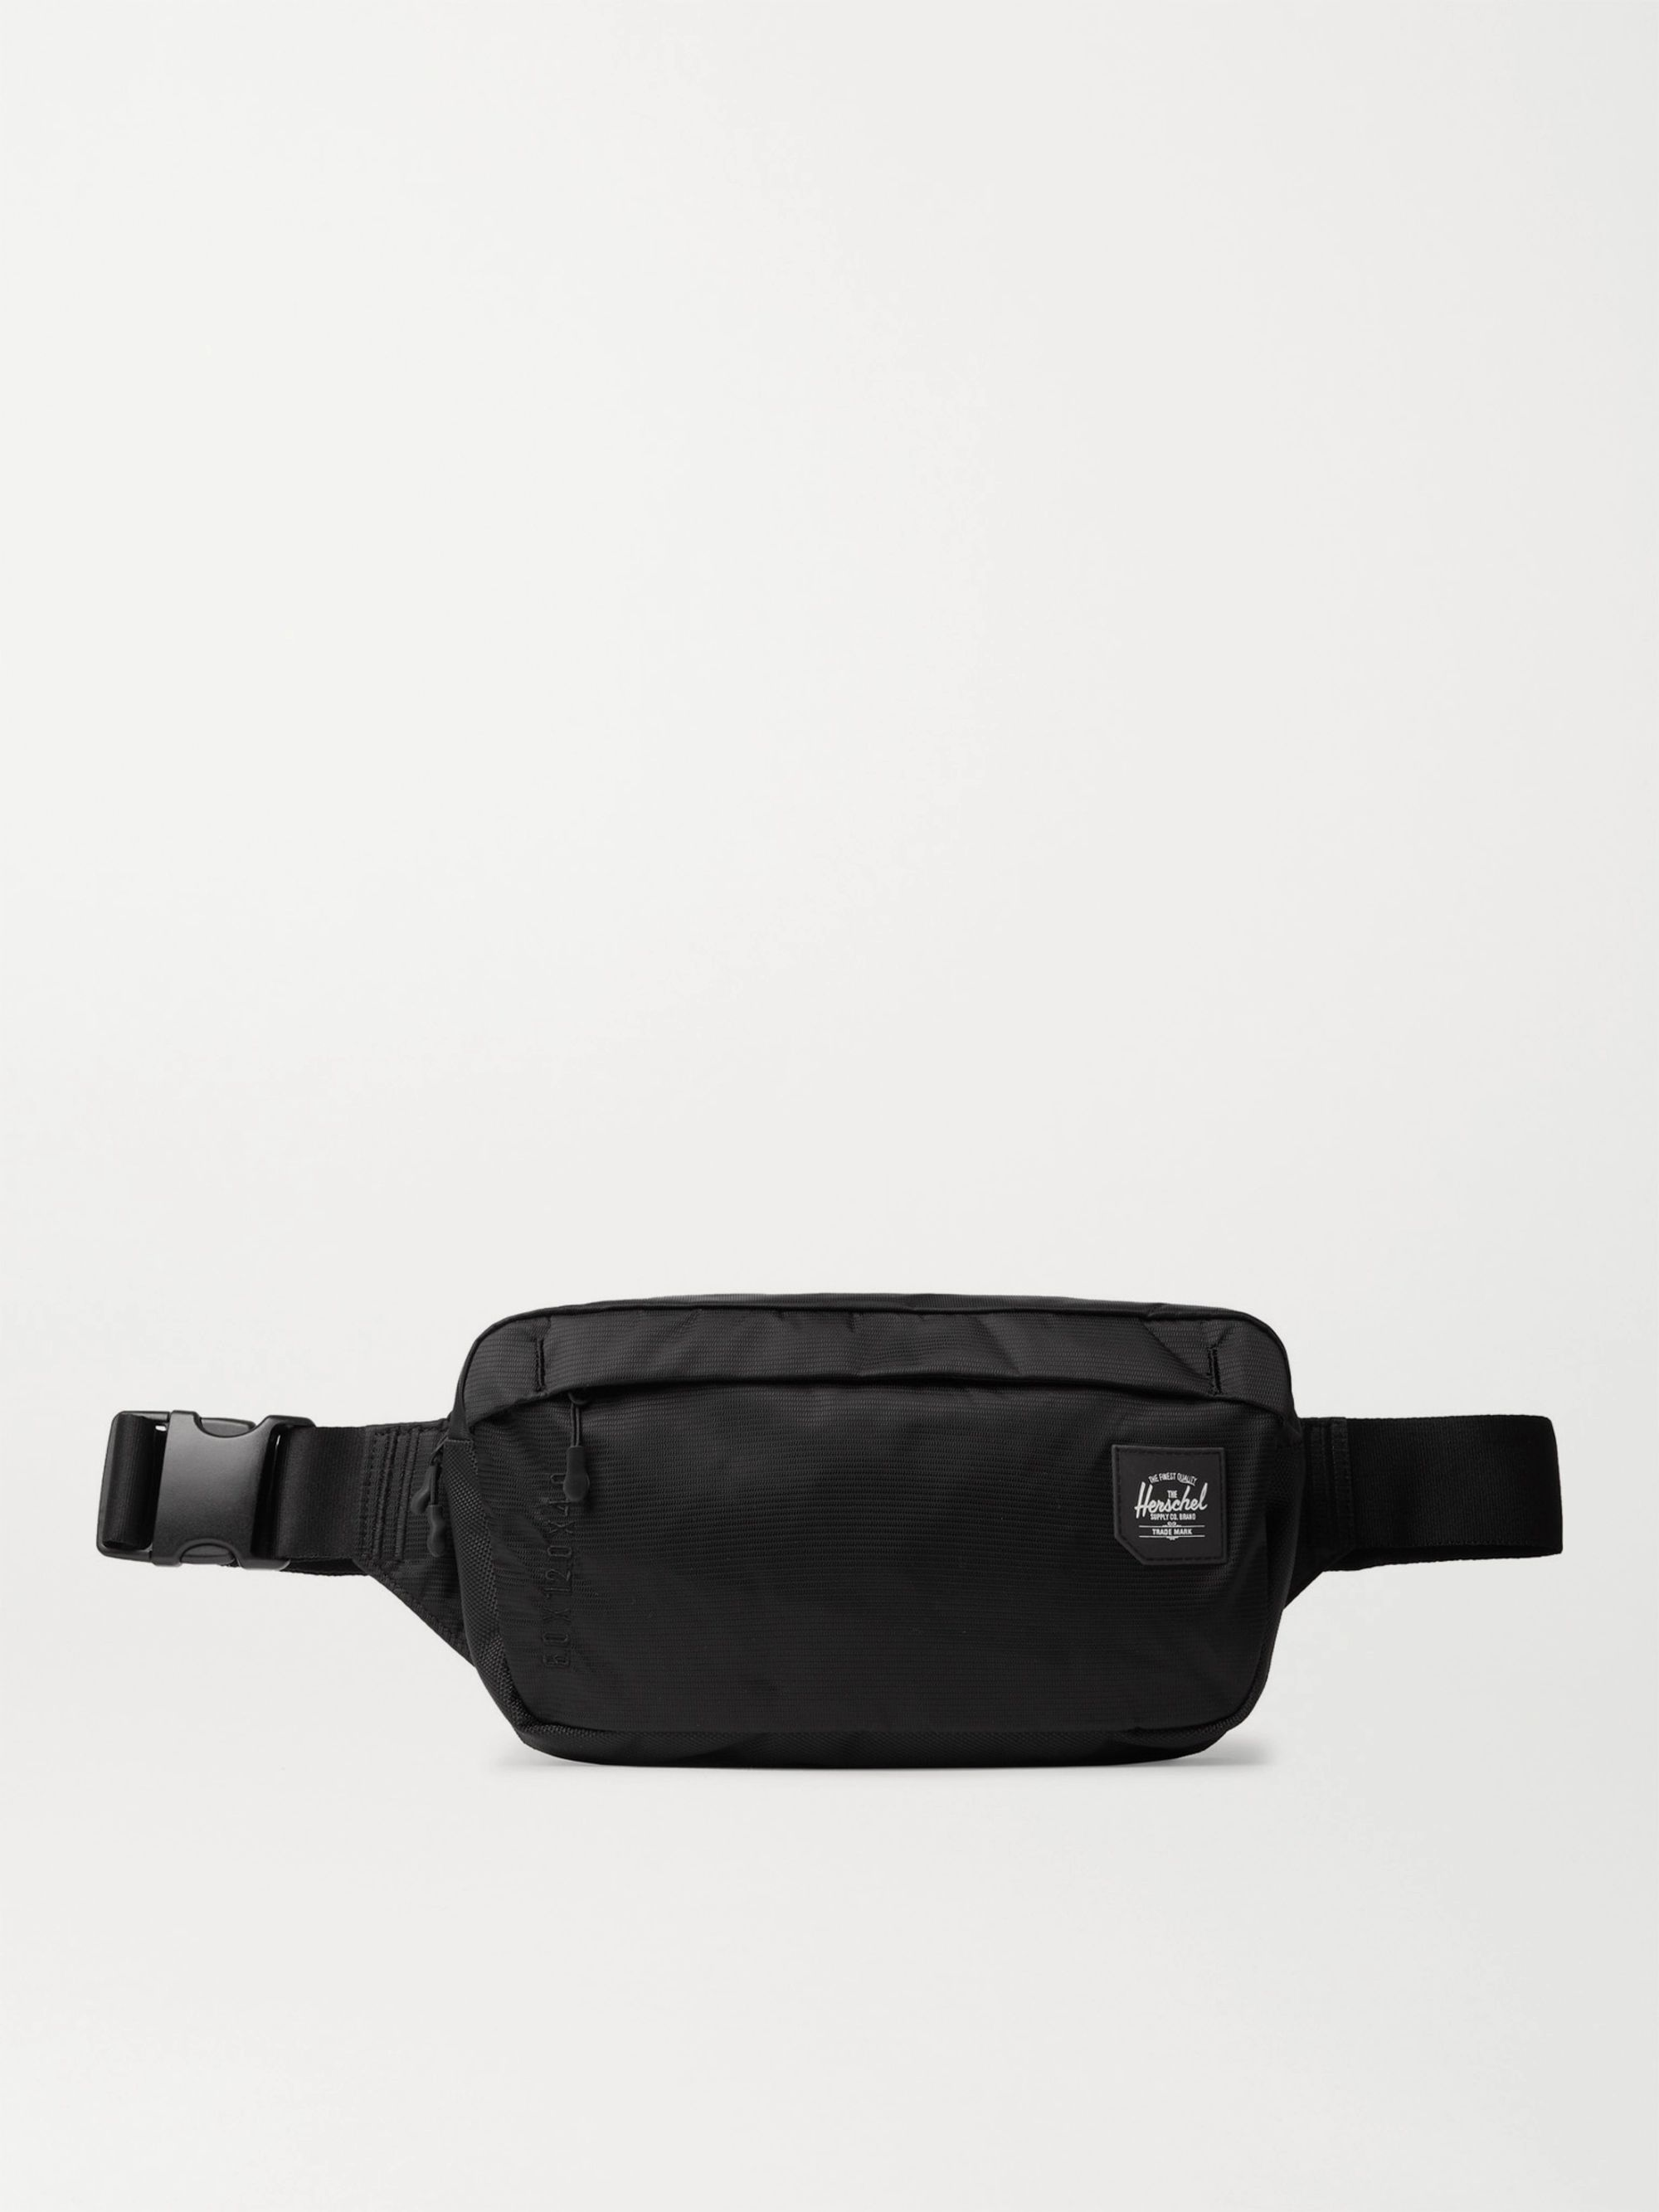 HERSCHEL SUPPLY CO Tour Medium Nylon Belt Bag,Black